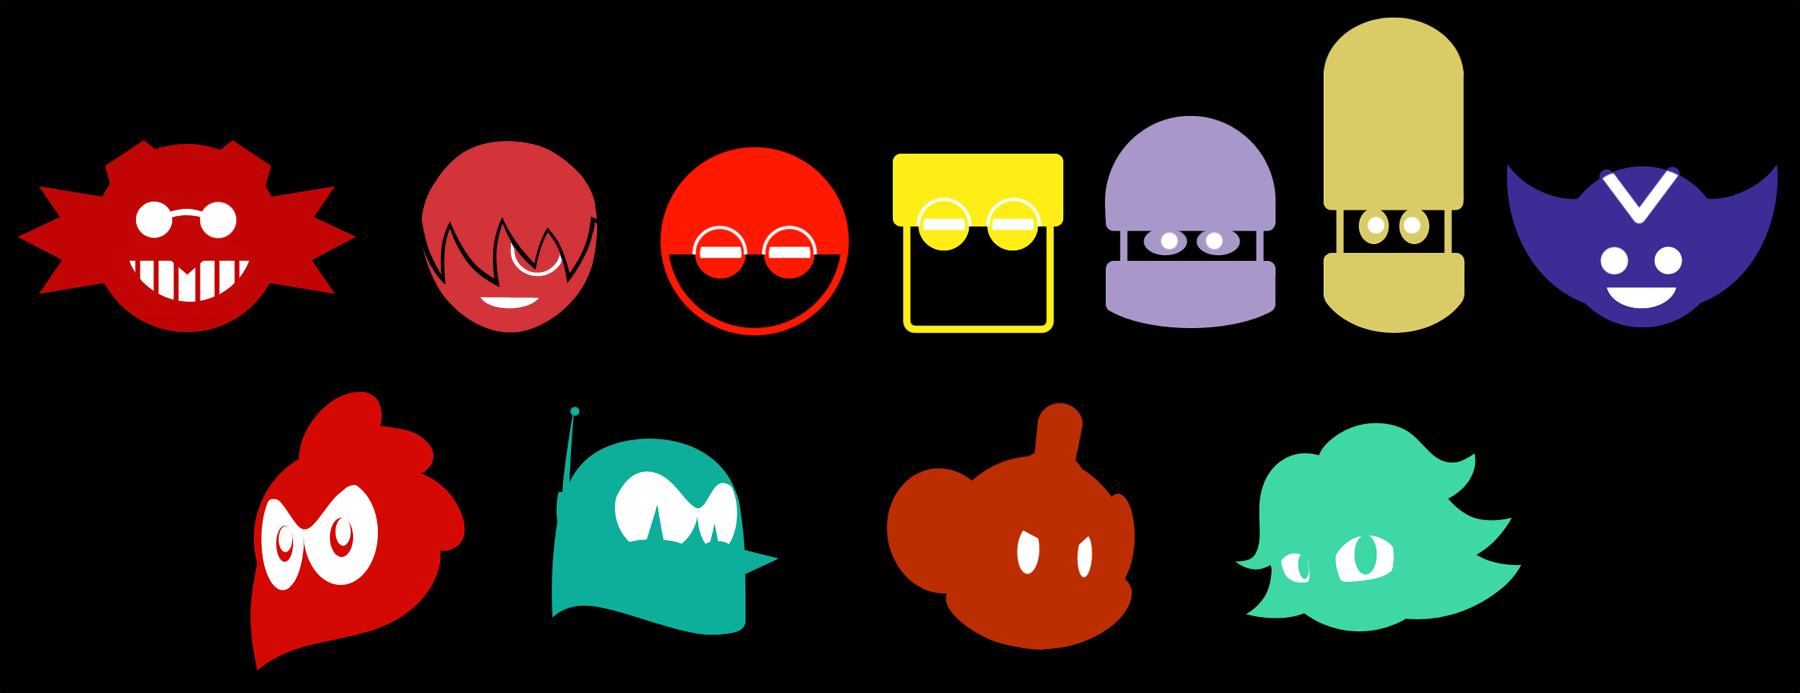 Eggman Empire And Crew Symbols By The Gitz On Deviantart